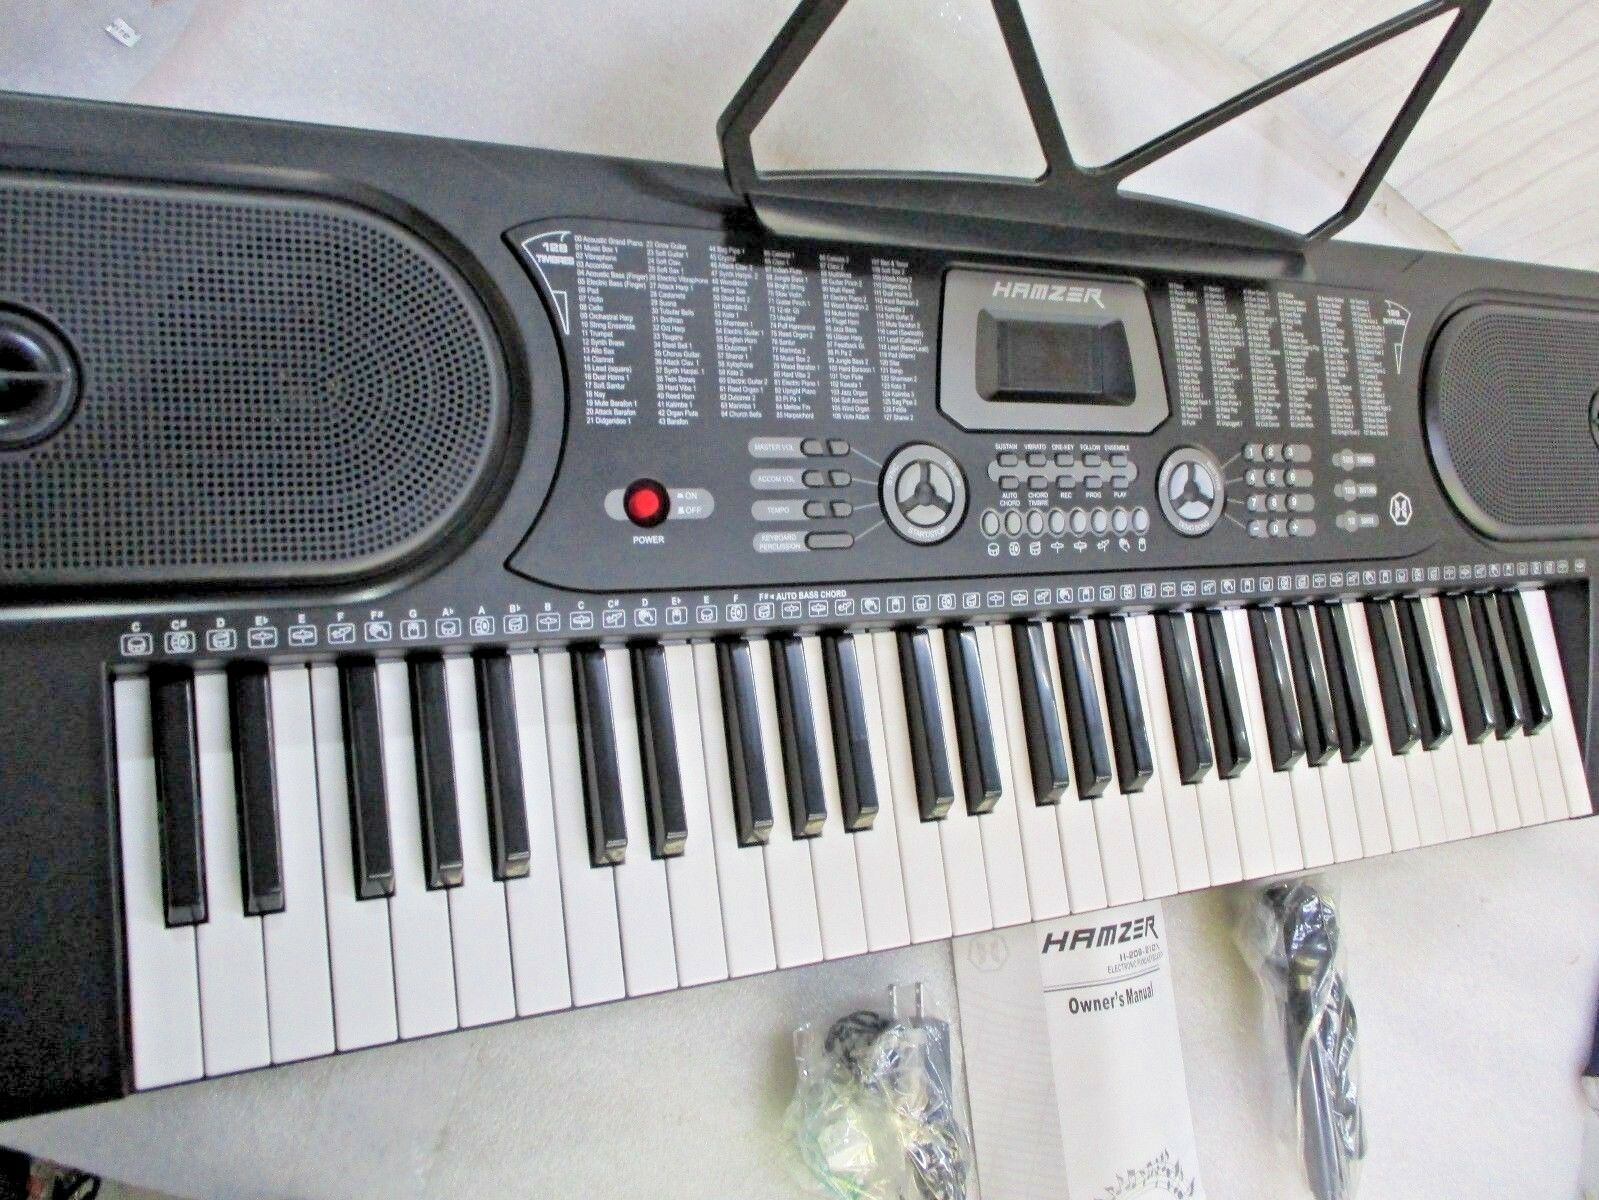 61 key digital music piano keyboard